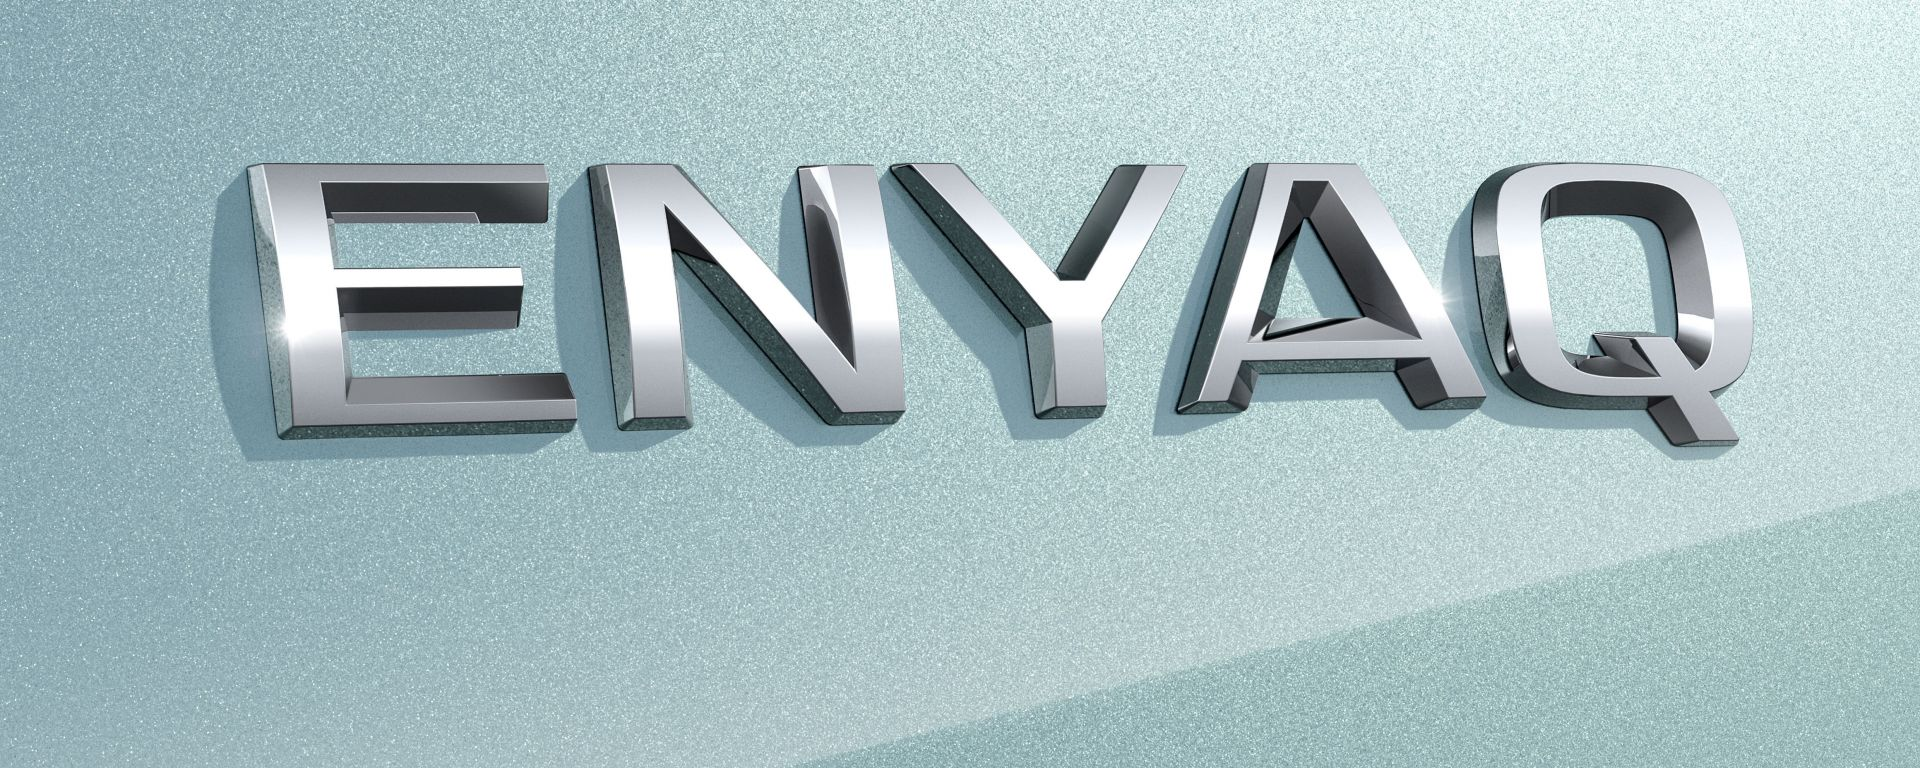 Il logo di Skoda Enyaq